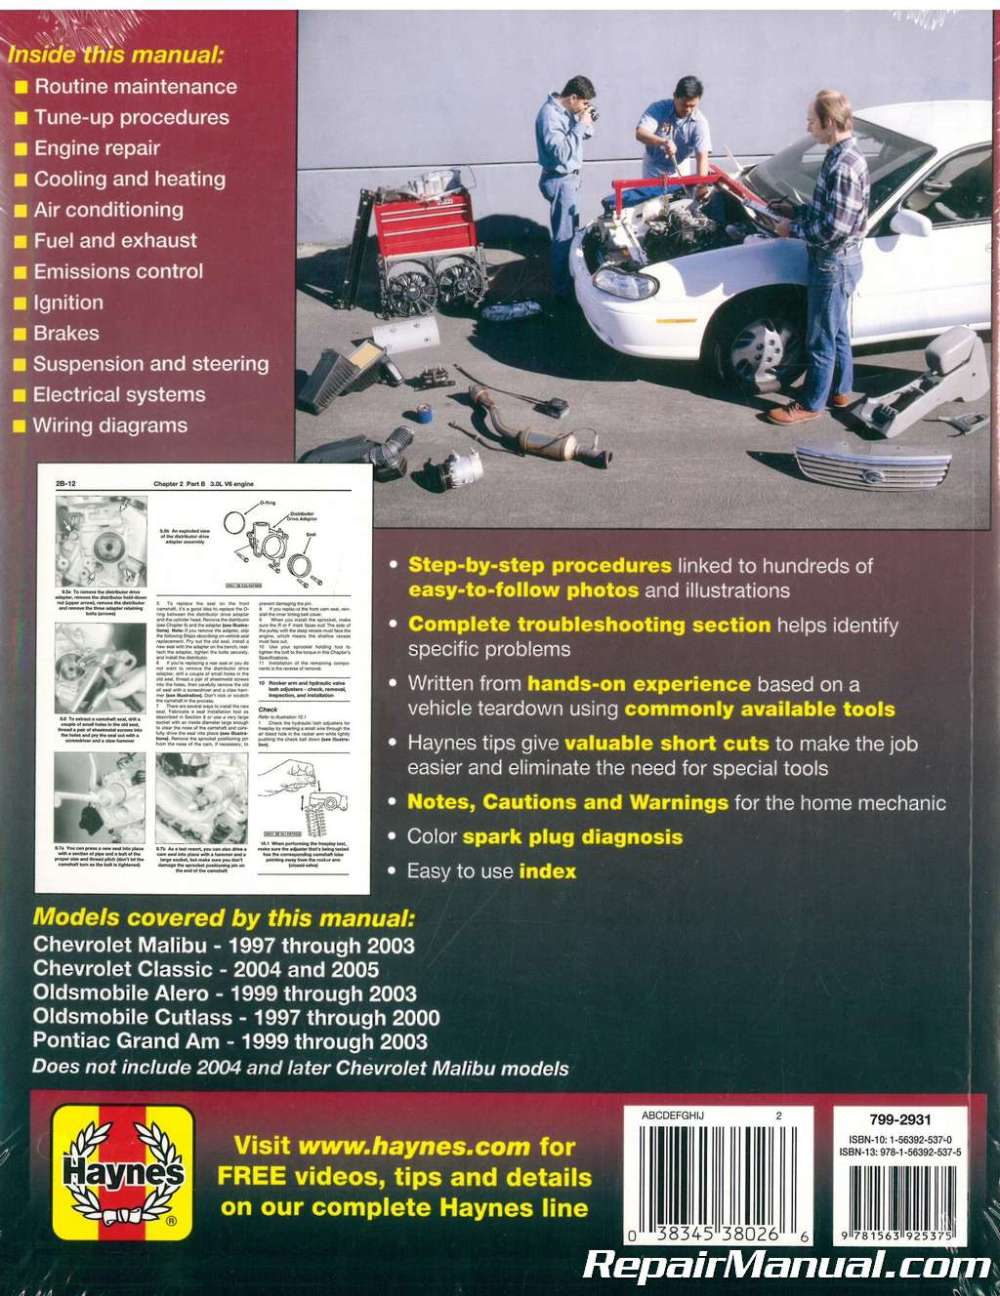 medium resolution of haynes gm chevrolet malibu oldsmobile alero cutlass and pontiac grand am